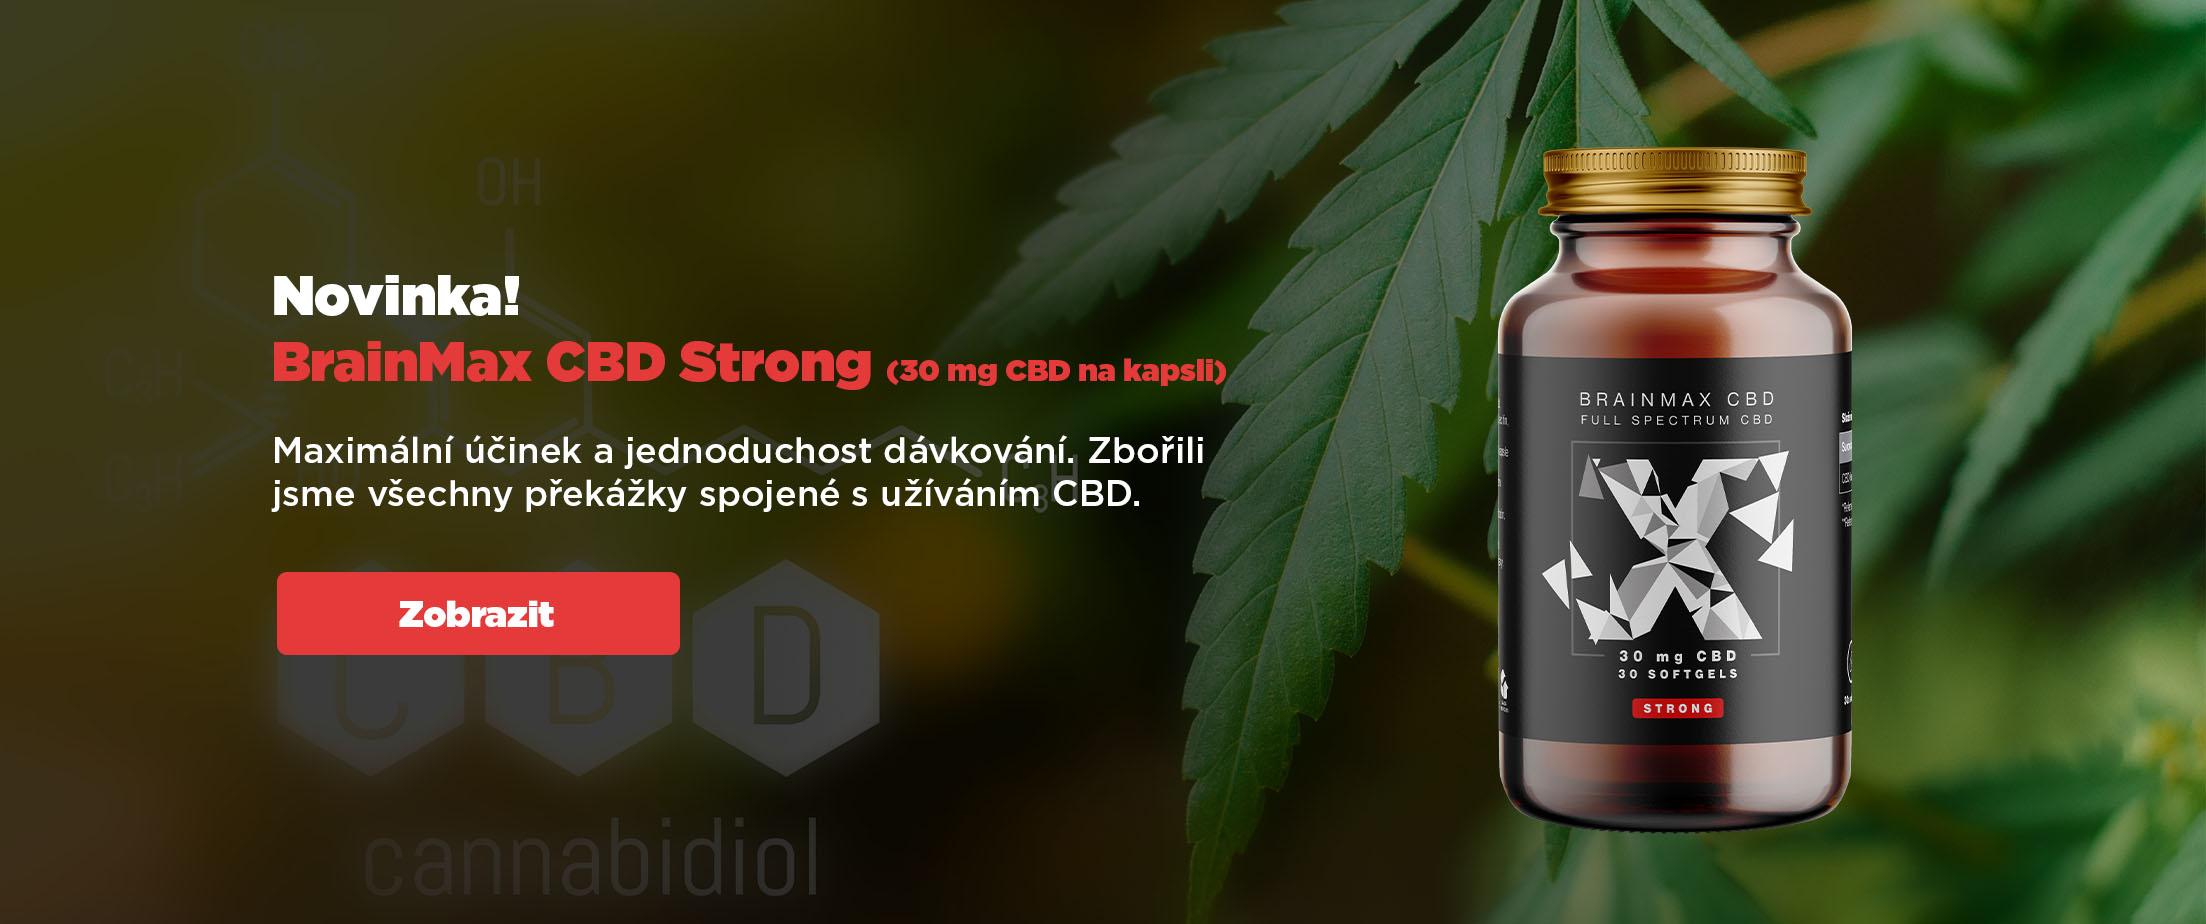 cbd_strong_eshop_pc_CZ